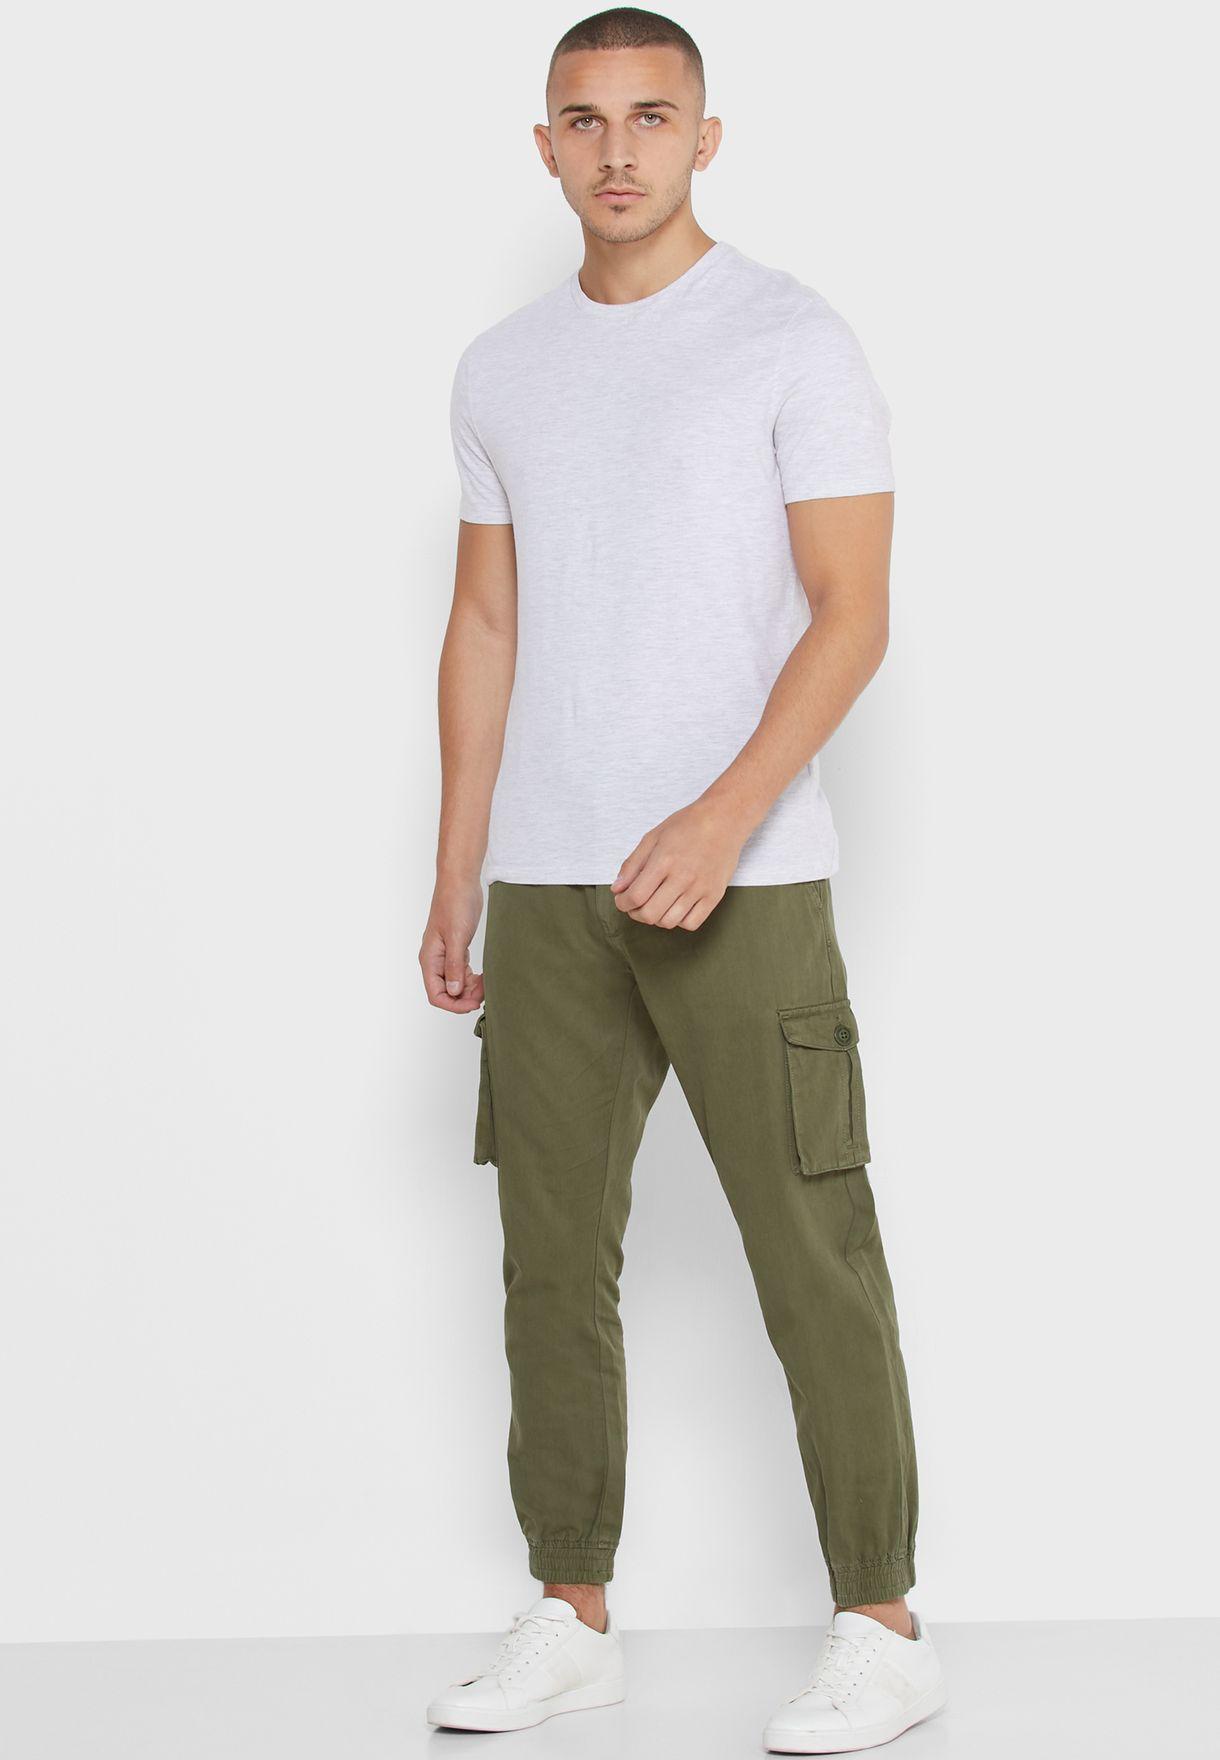 Drawstring Cuffed Cargo Pants